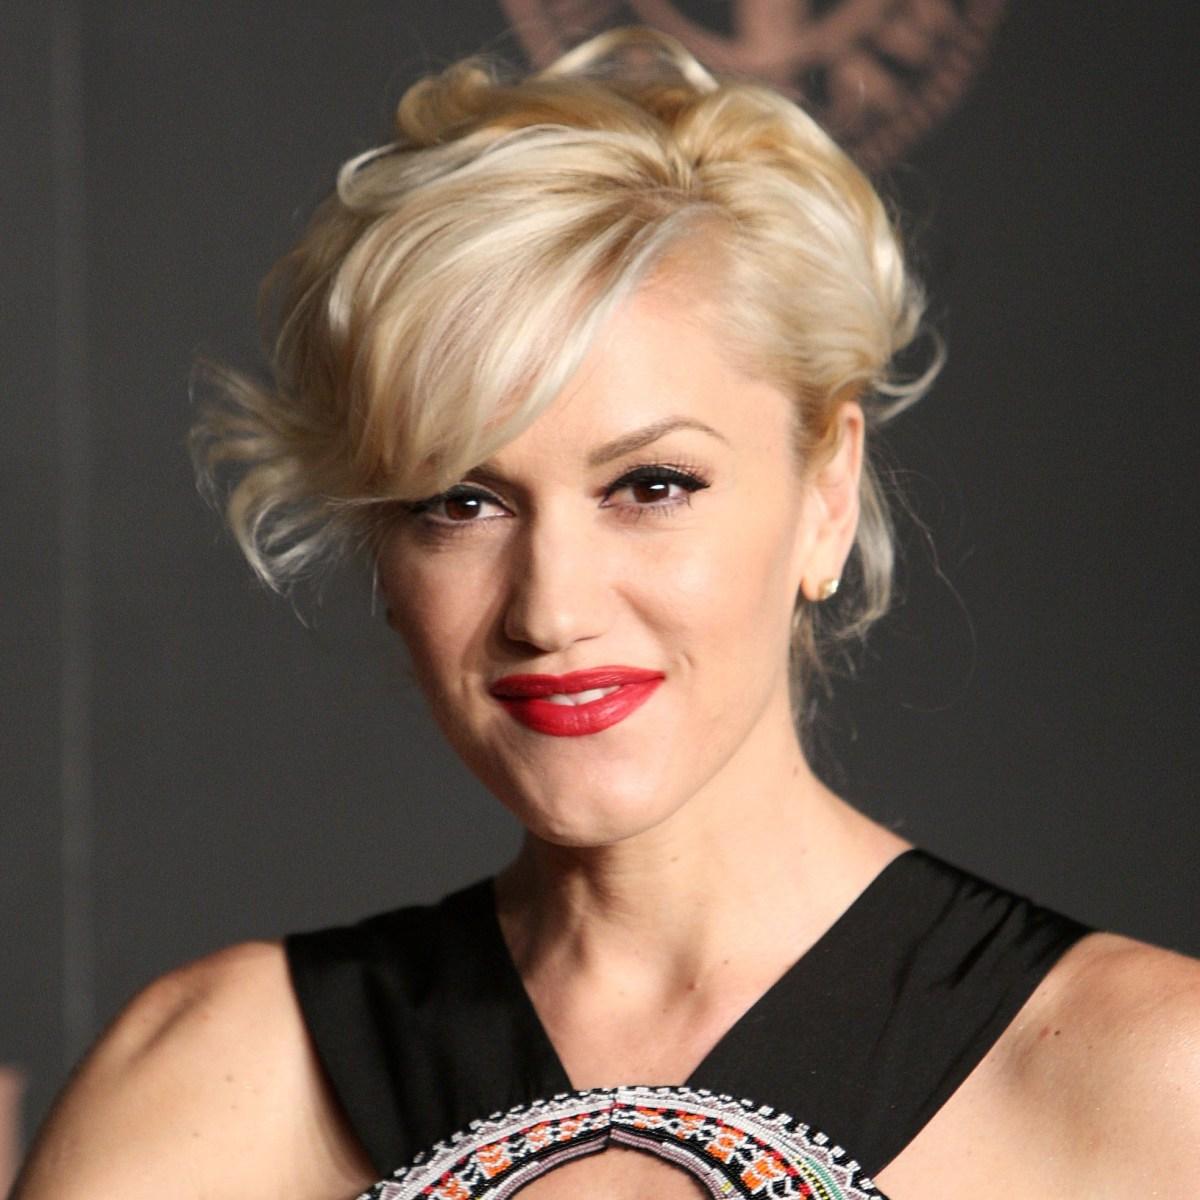 What Did Gwen Stefani Look Like Before Plastic Surgery? See